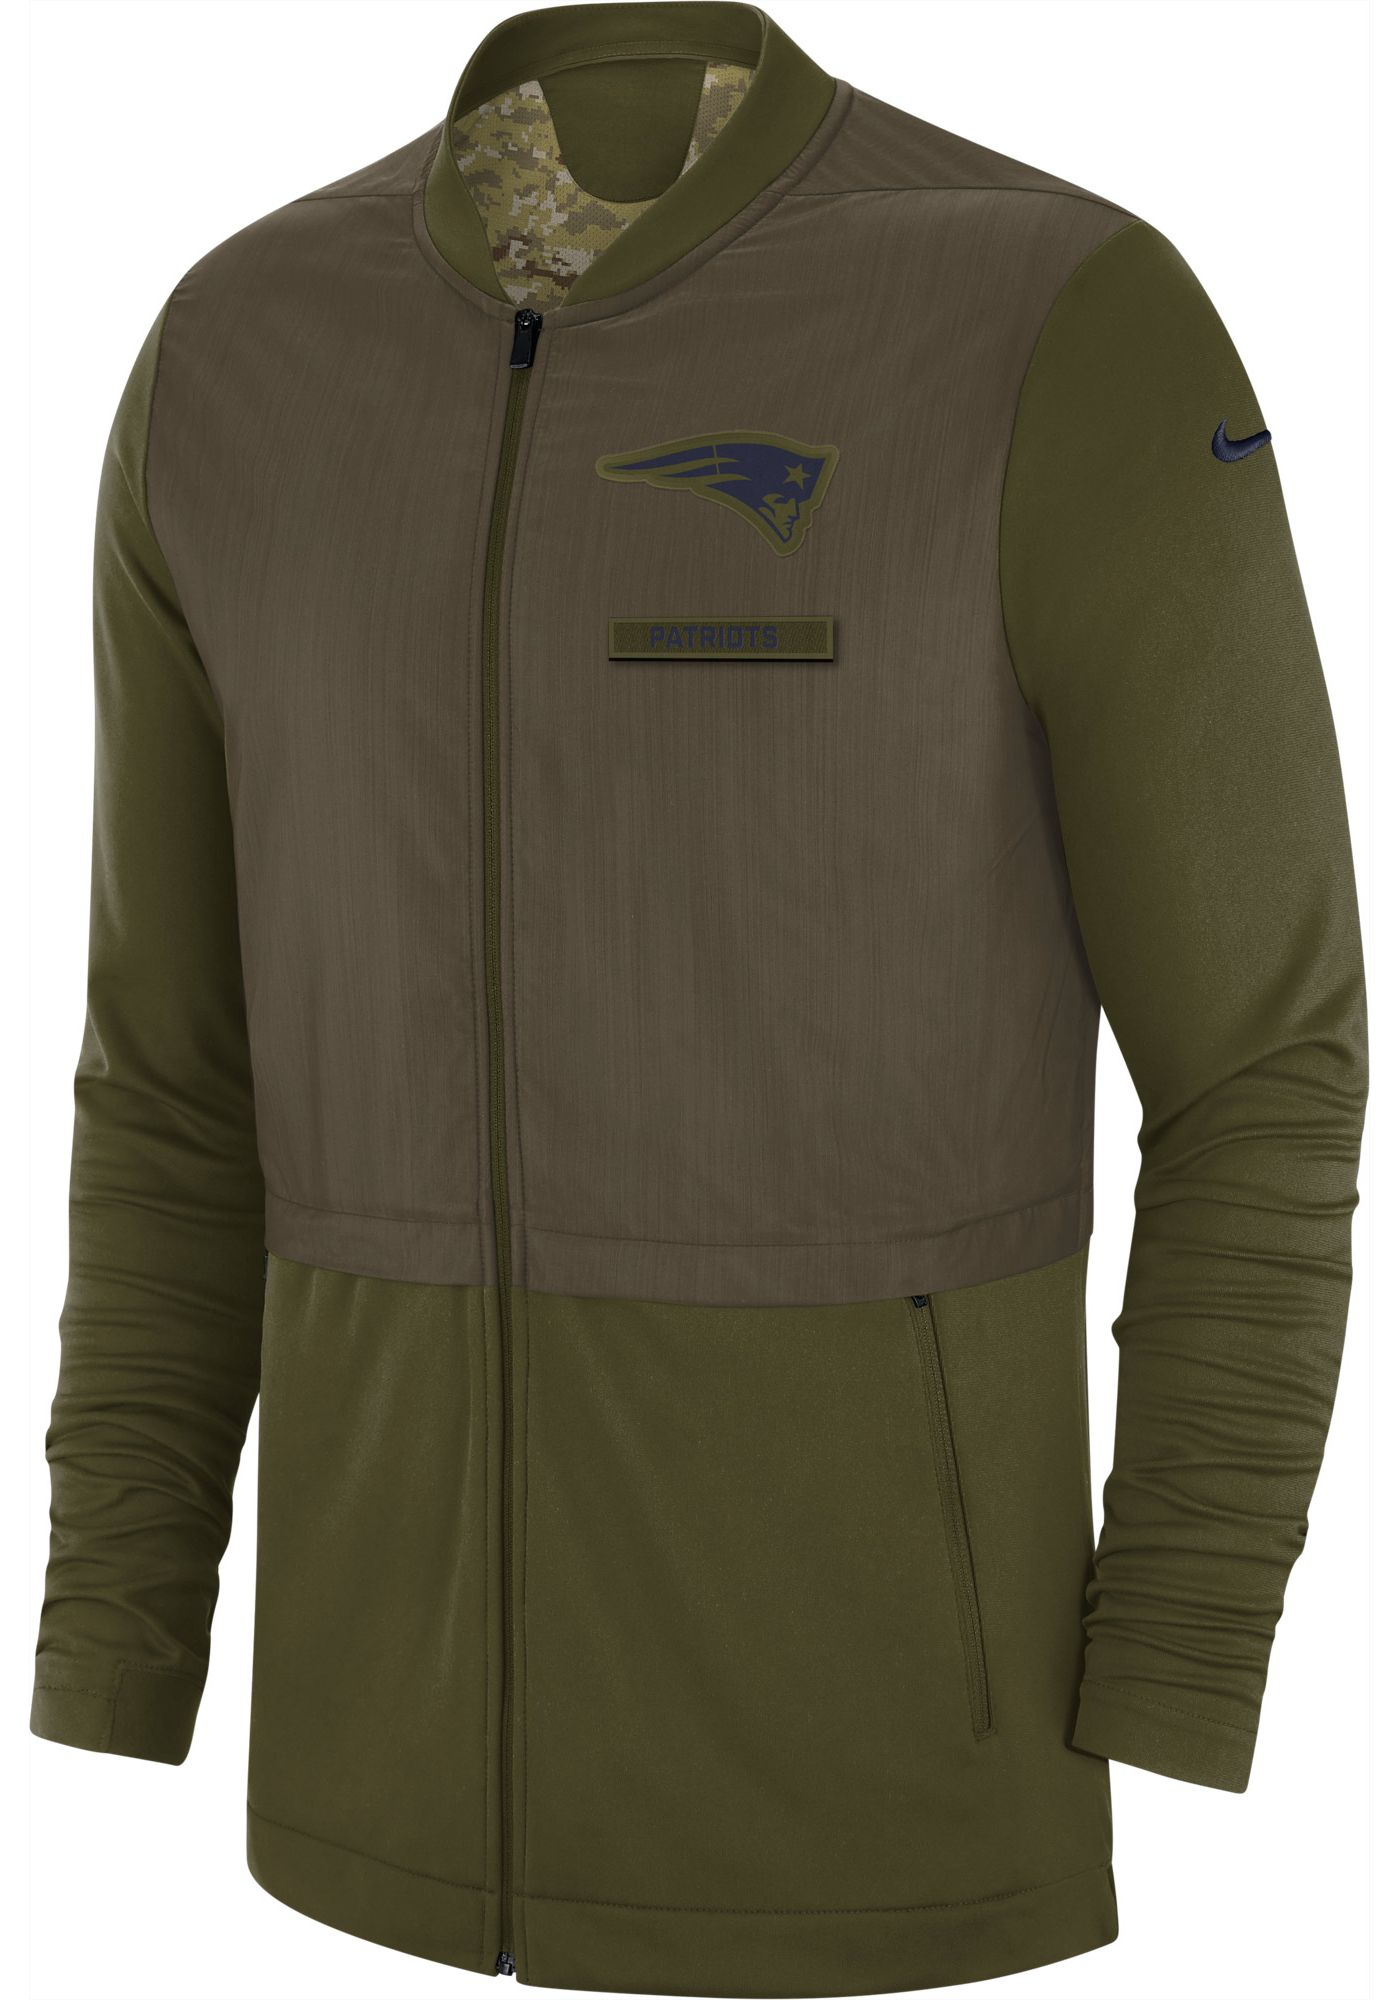 Nike Men's Salute to Service New England Patriots Hybrid Full-Zip Jacket